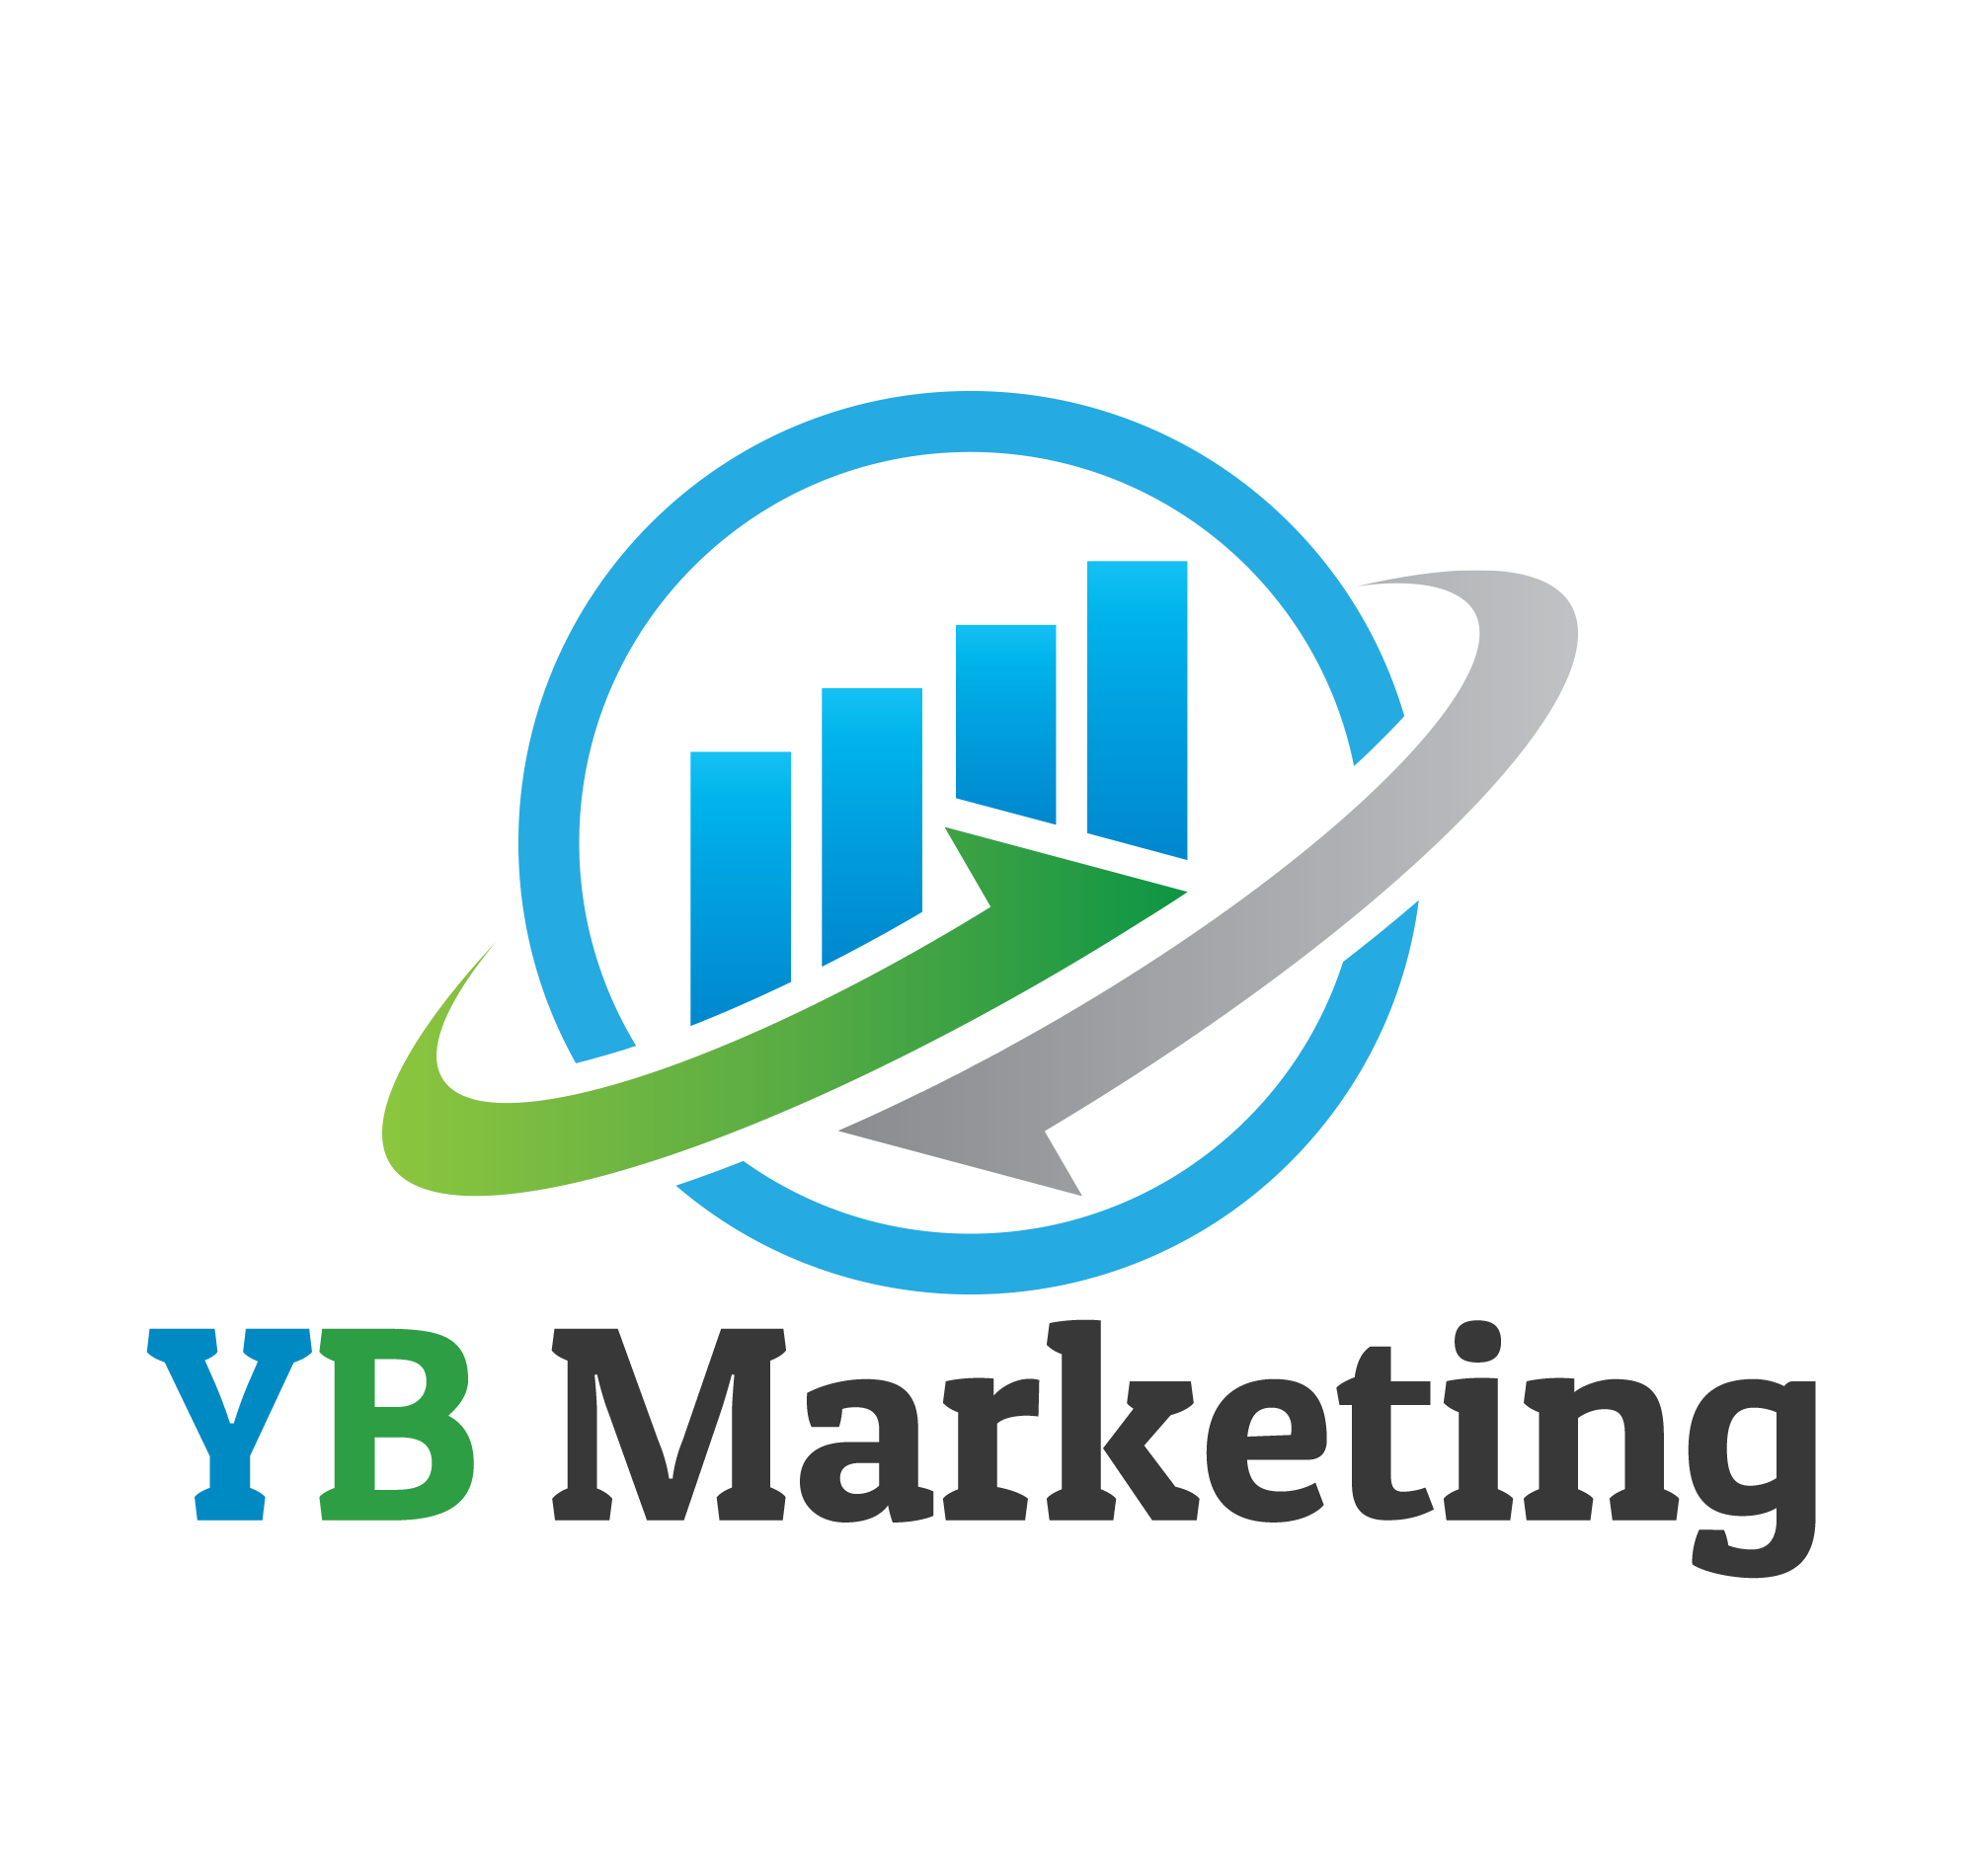 yb marketing